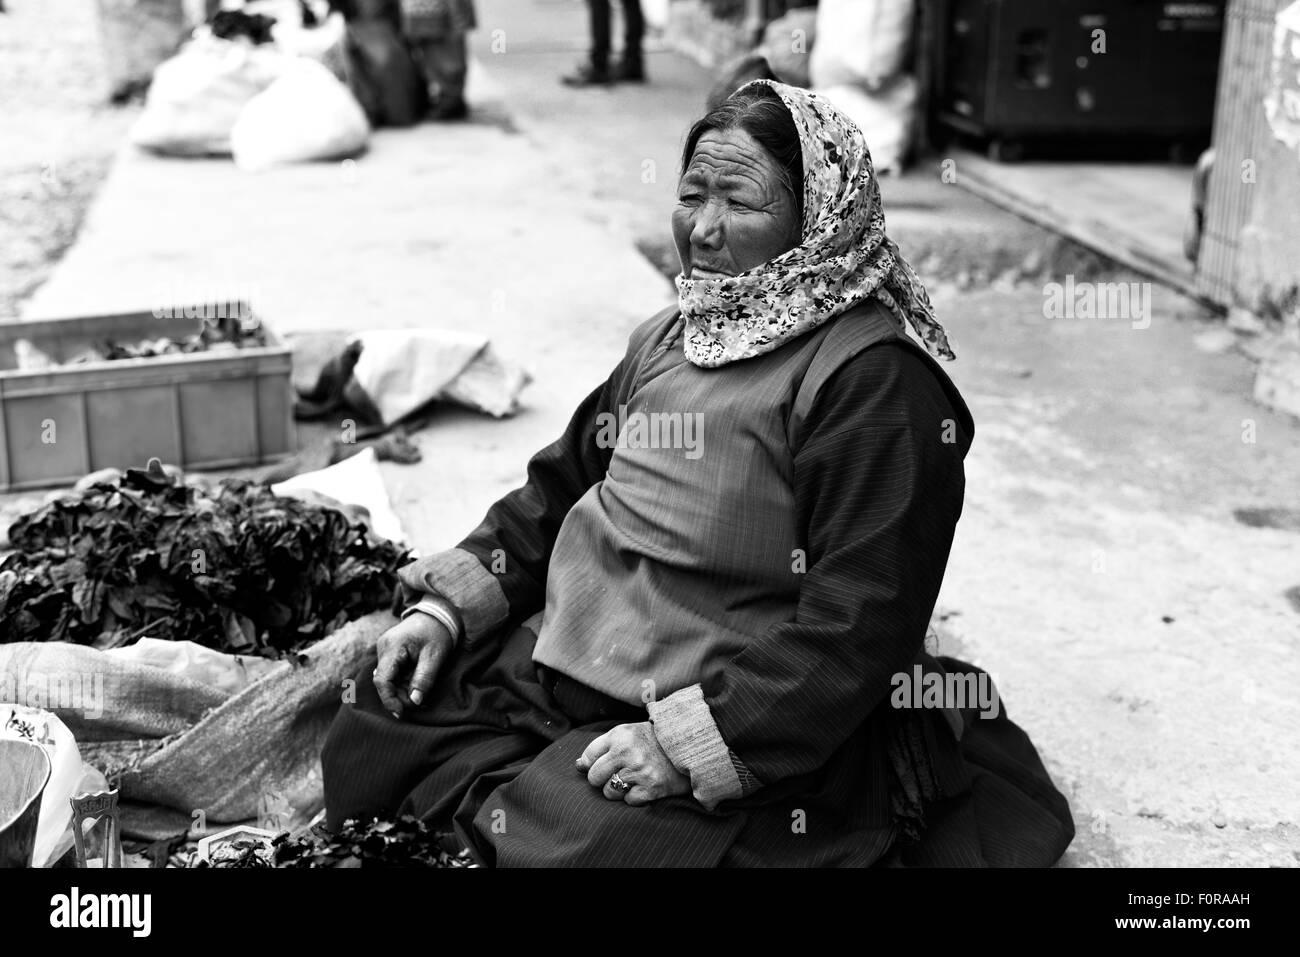 India Jammu Kashmir Ladakh A woman at the market - Stock Image